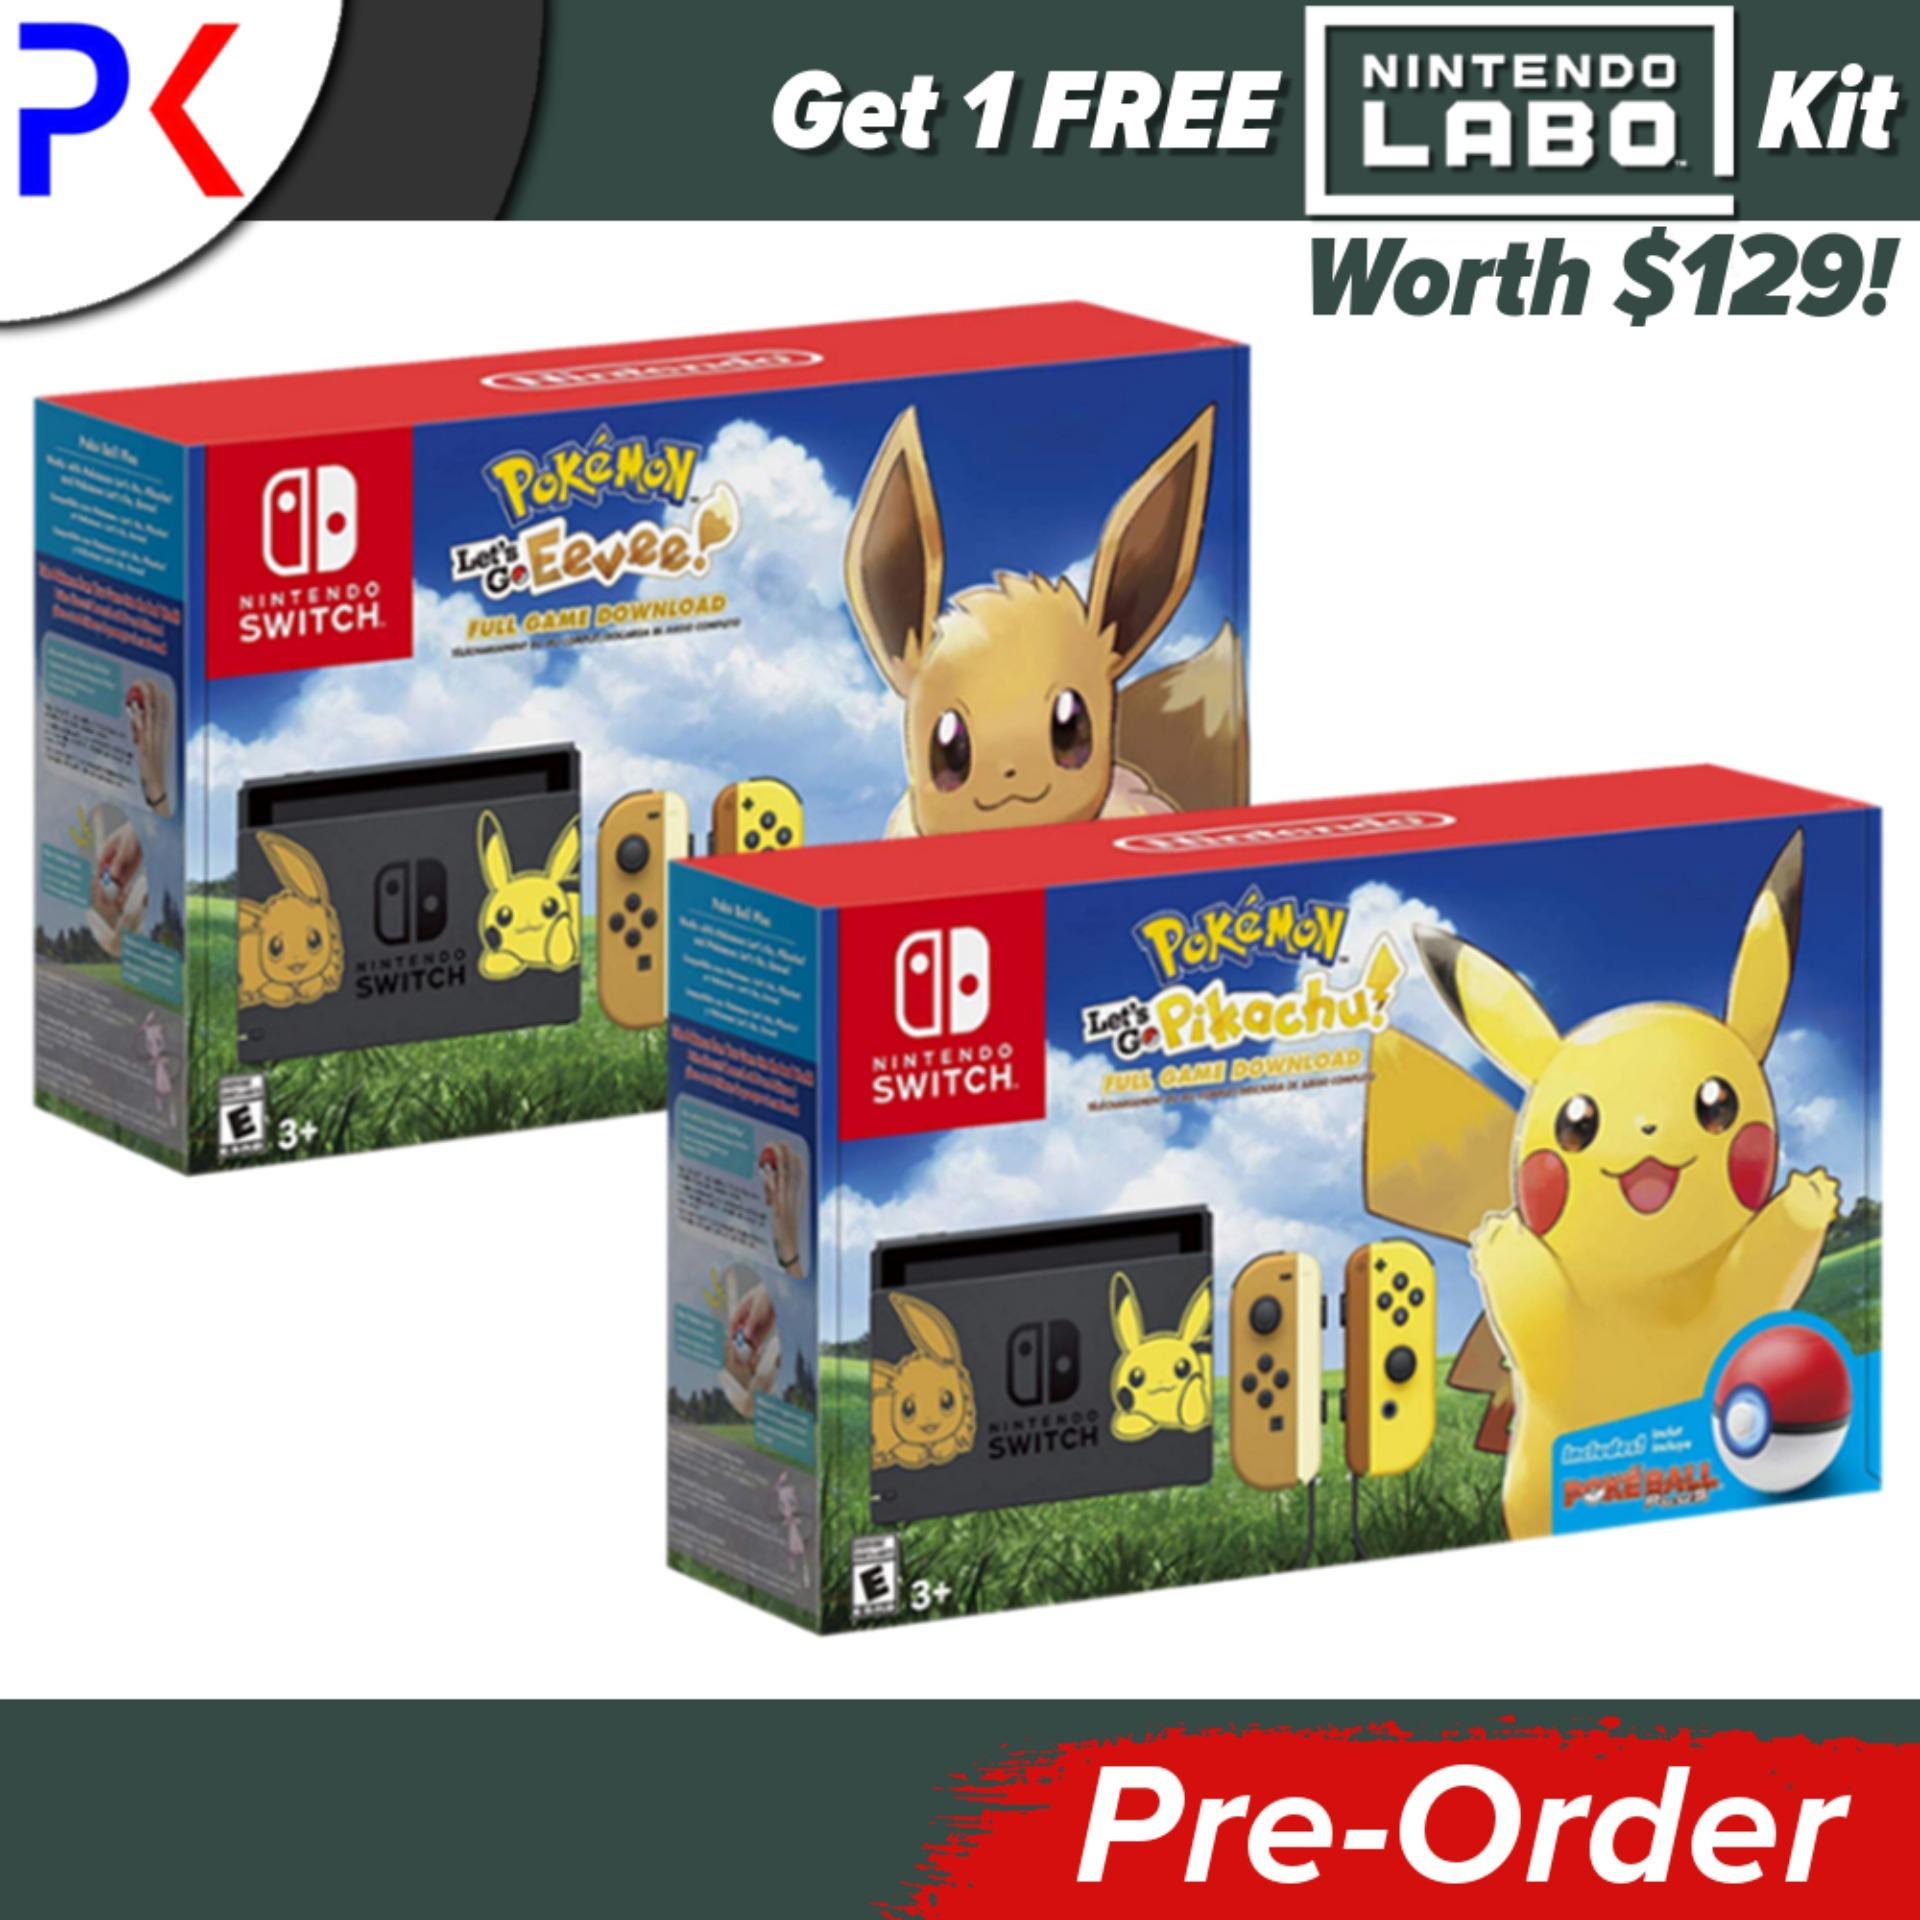 [Pre-Order] Nintendo Switch Console Pokemon Lets Go Edition [ASIA] + Free Labo Kit (Ships earliest 16 November)